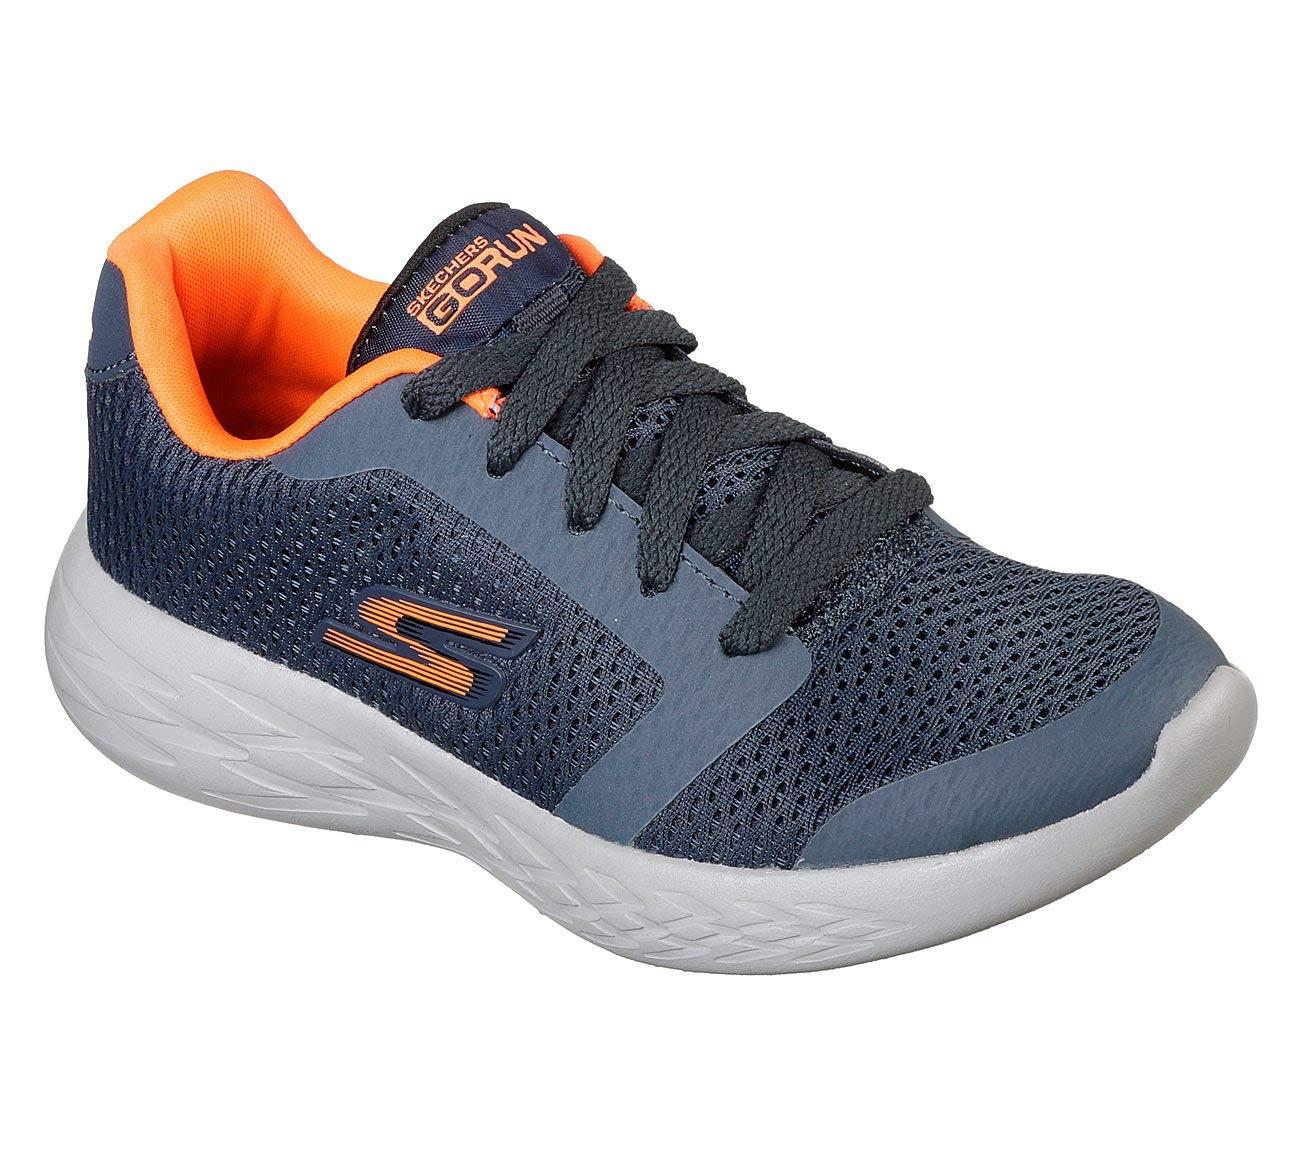 Skechers Boy's GOrun 600 - Zeeton, Running, Slate Gray, 3.5 US M